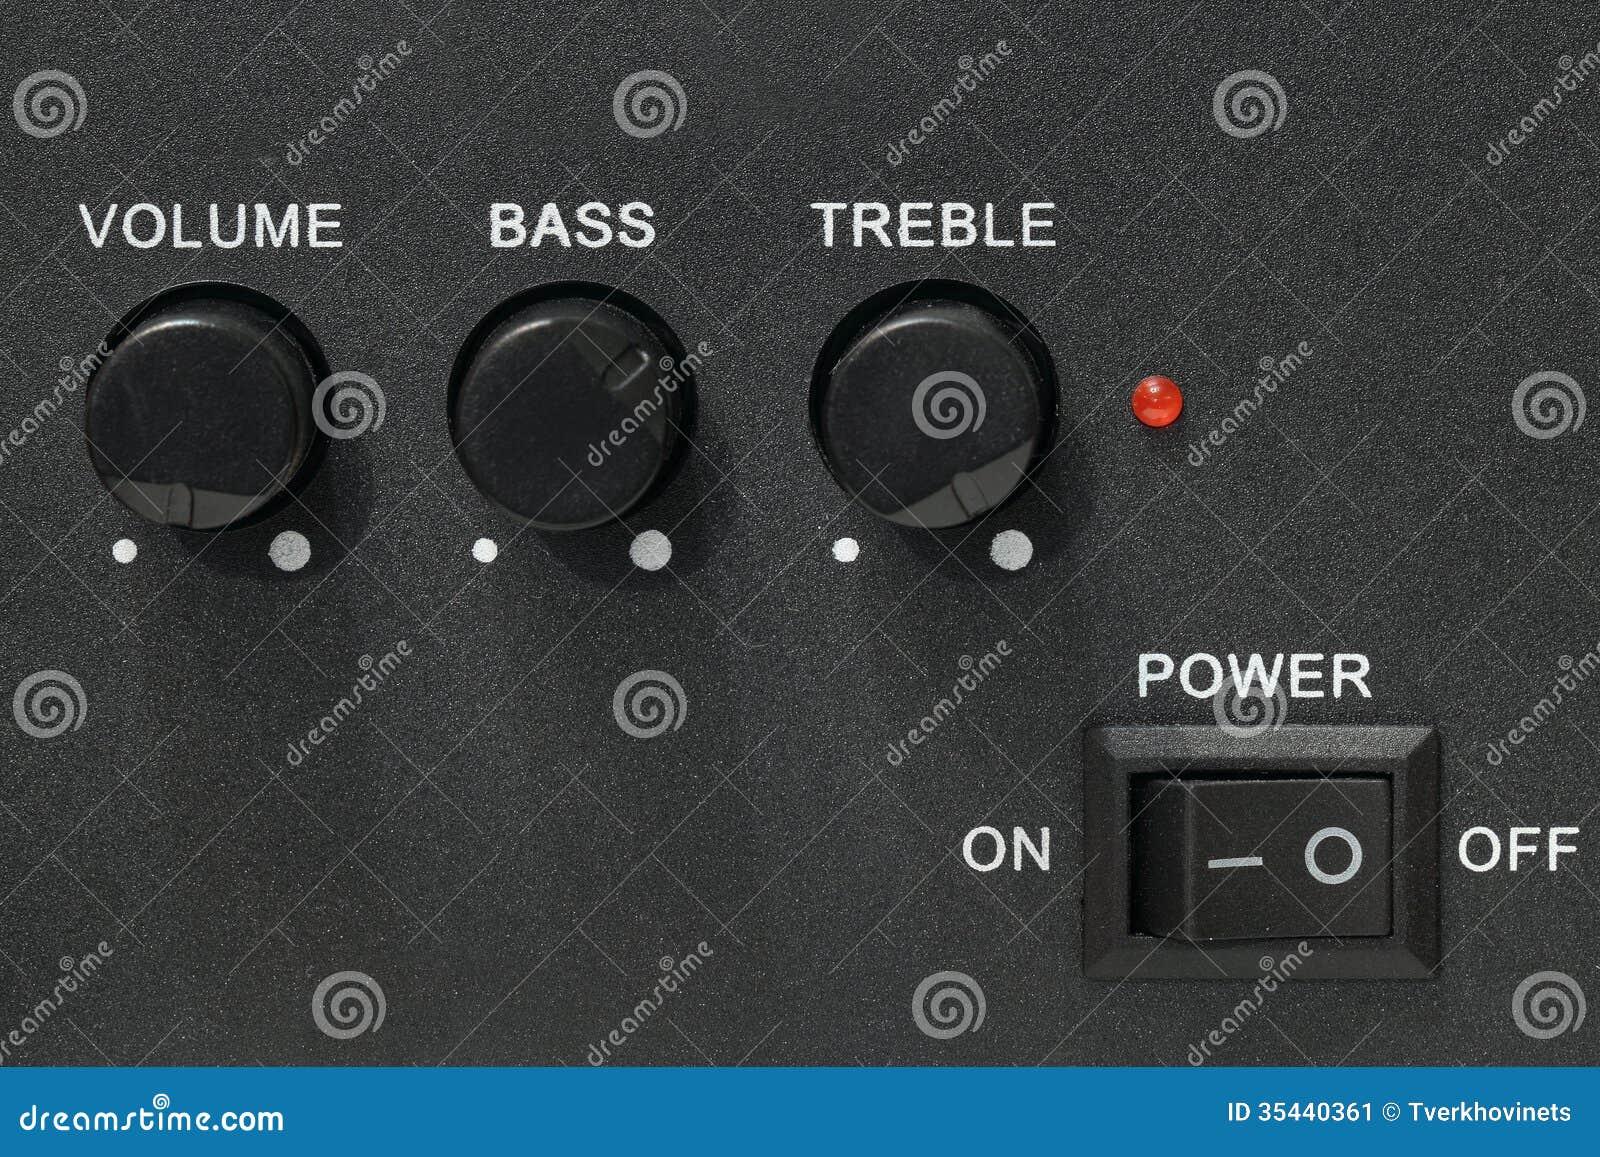 Volume Sound Control Panel : Speakers settings panel stock image